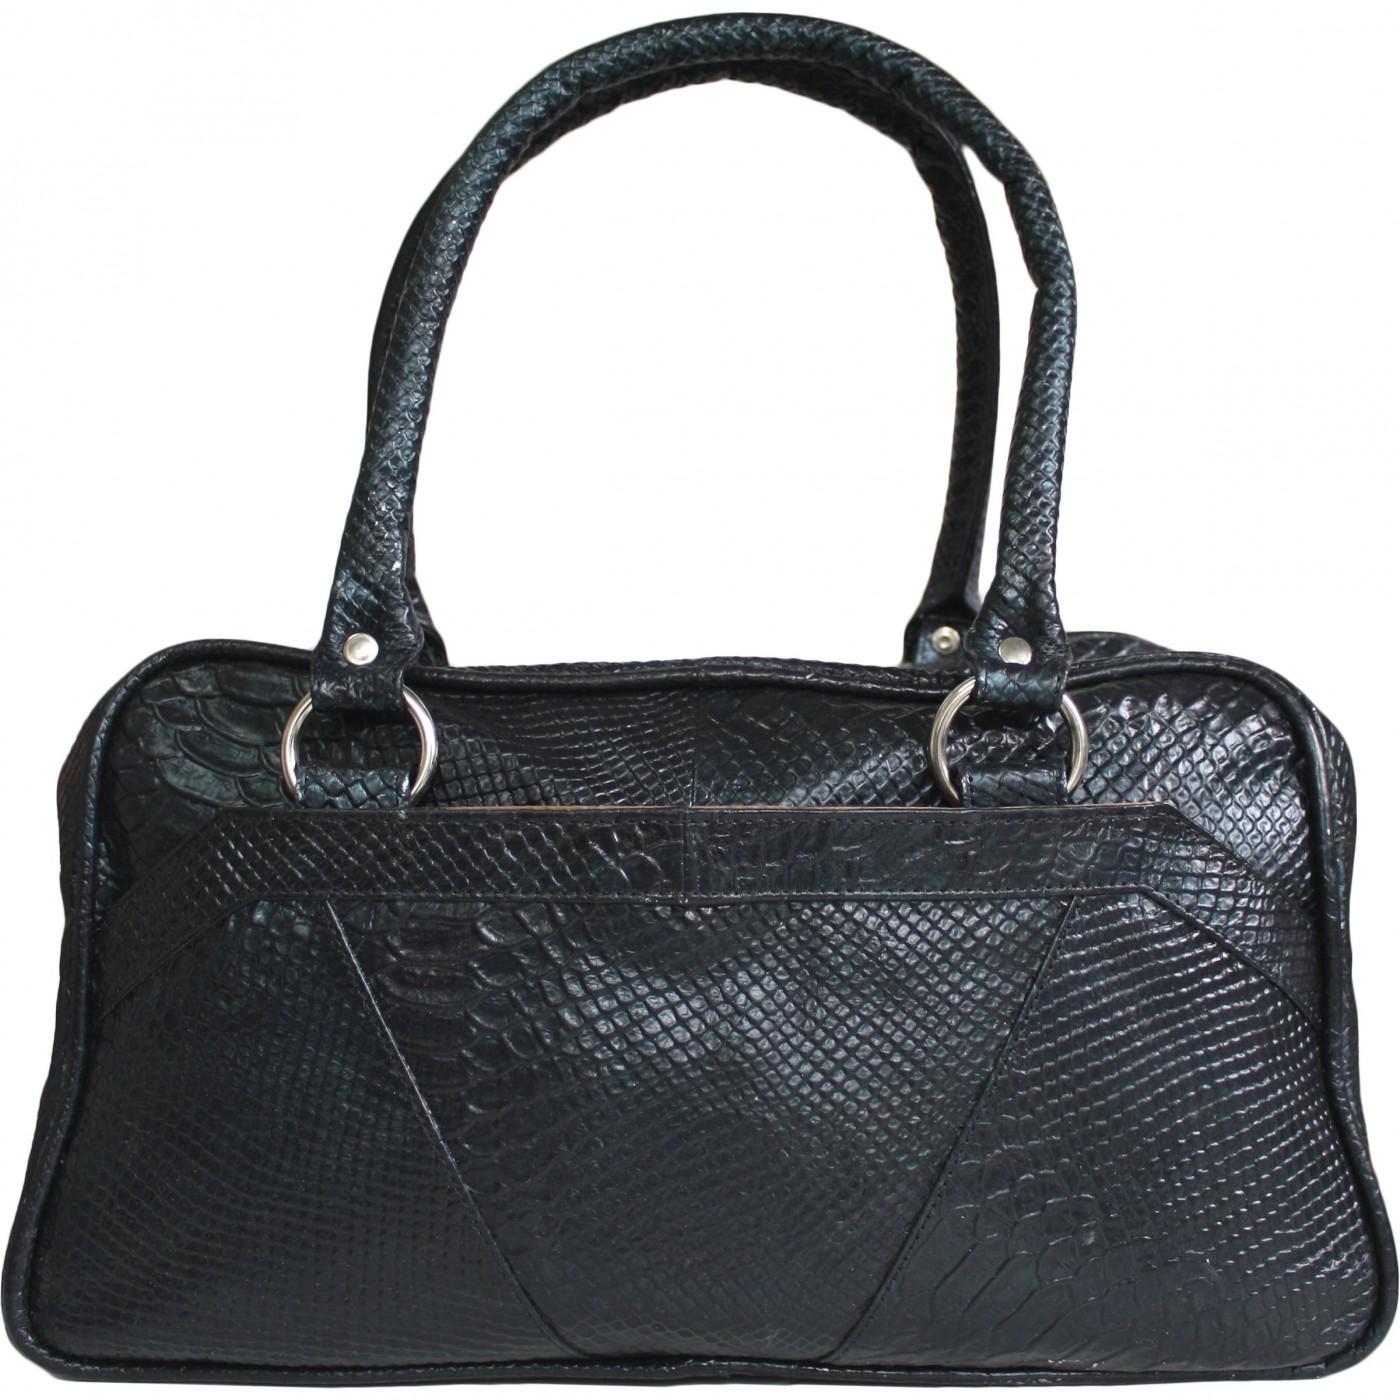 damen lederhandtasche ledertasche handtasche tasche tragetasche echtleder blau. Black Bedroom Furniture Sets. Home Design Ideas